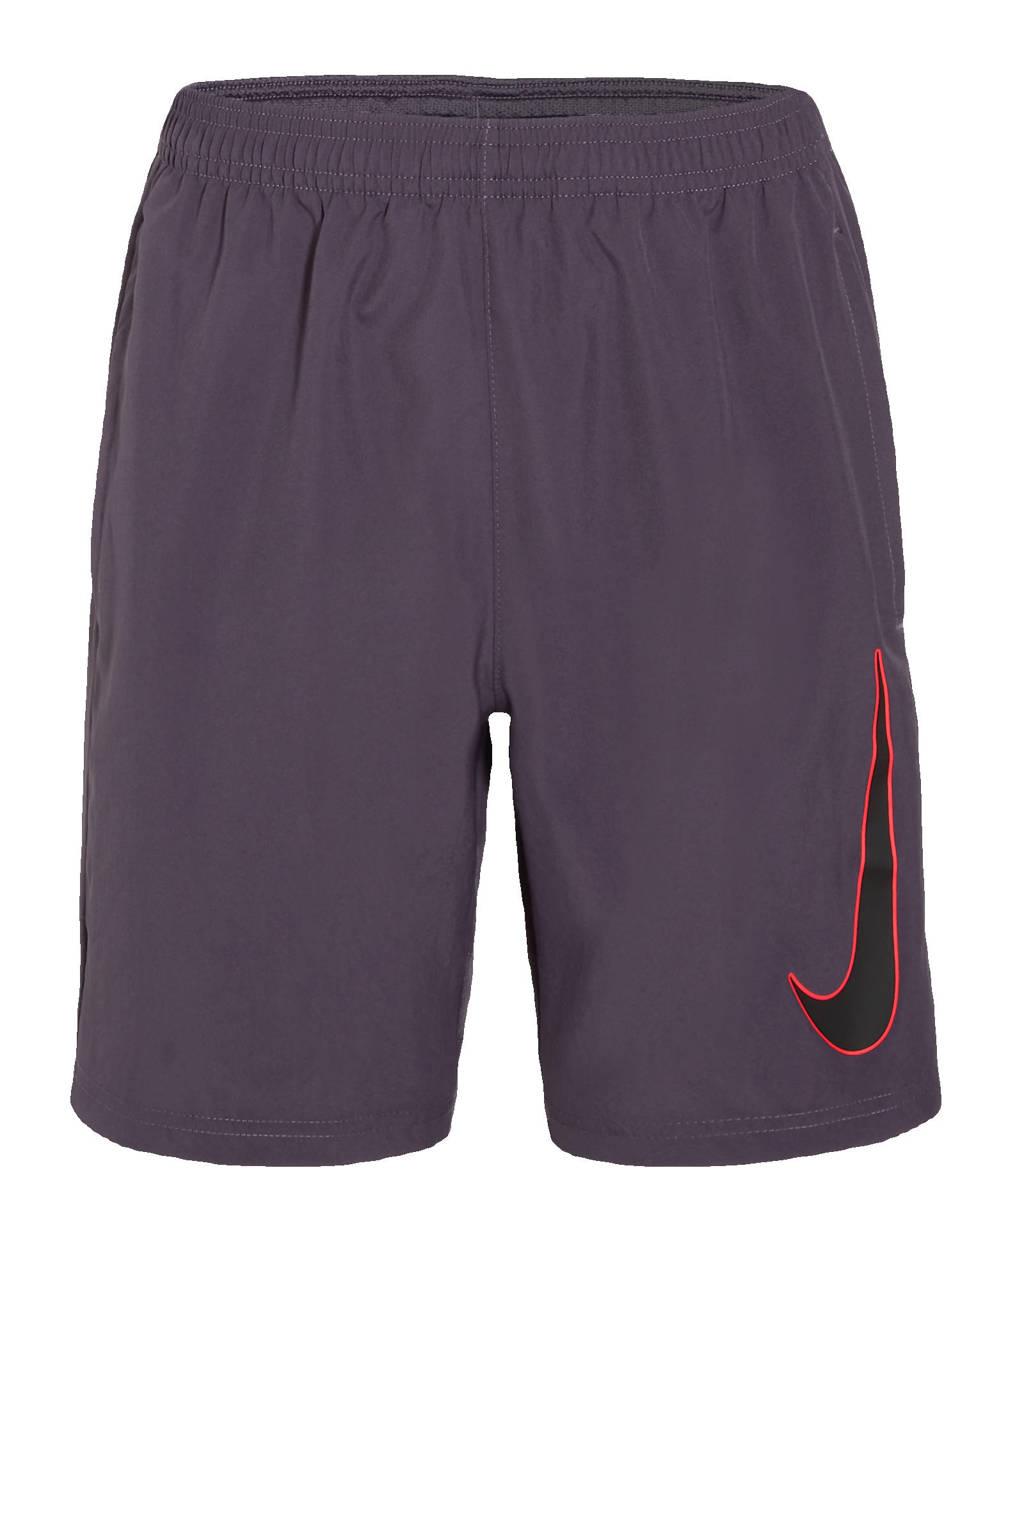 Nike Junior  sportshort donkerpaars/zwart, Donkerpaars/zwart